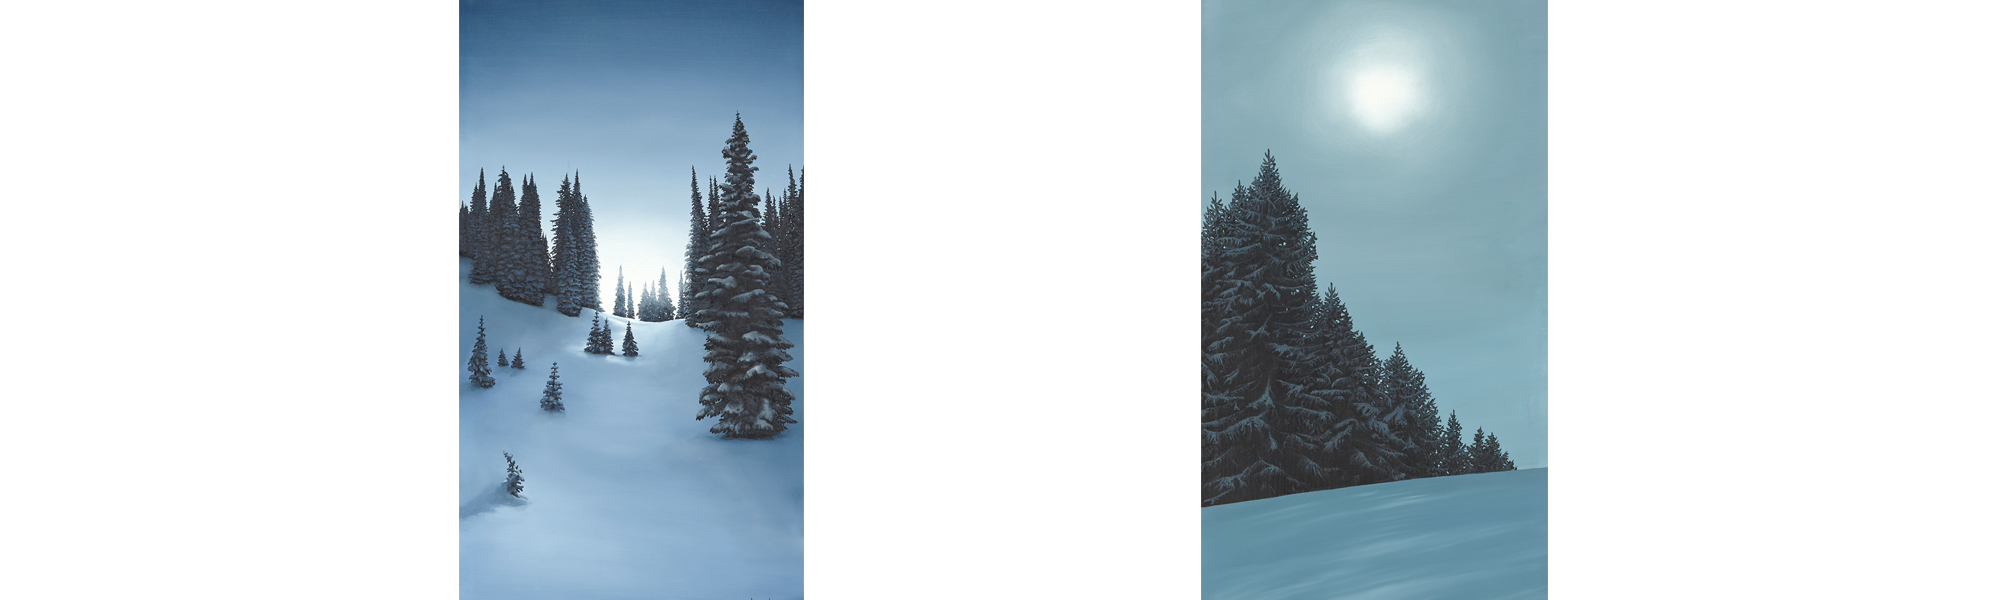 France Canada Attew Painting Landscape artist art ski snowboard mountain winter Snow Alpine Alps montagne Alpes